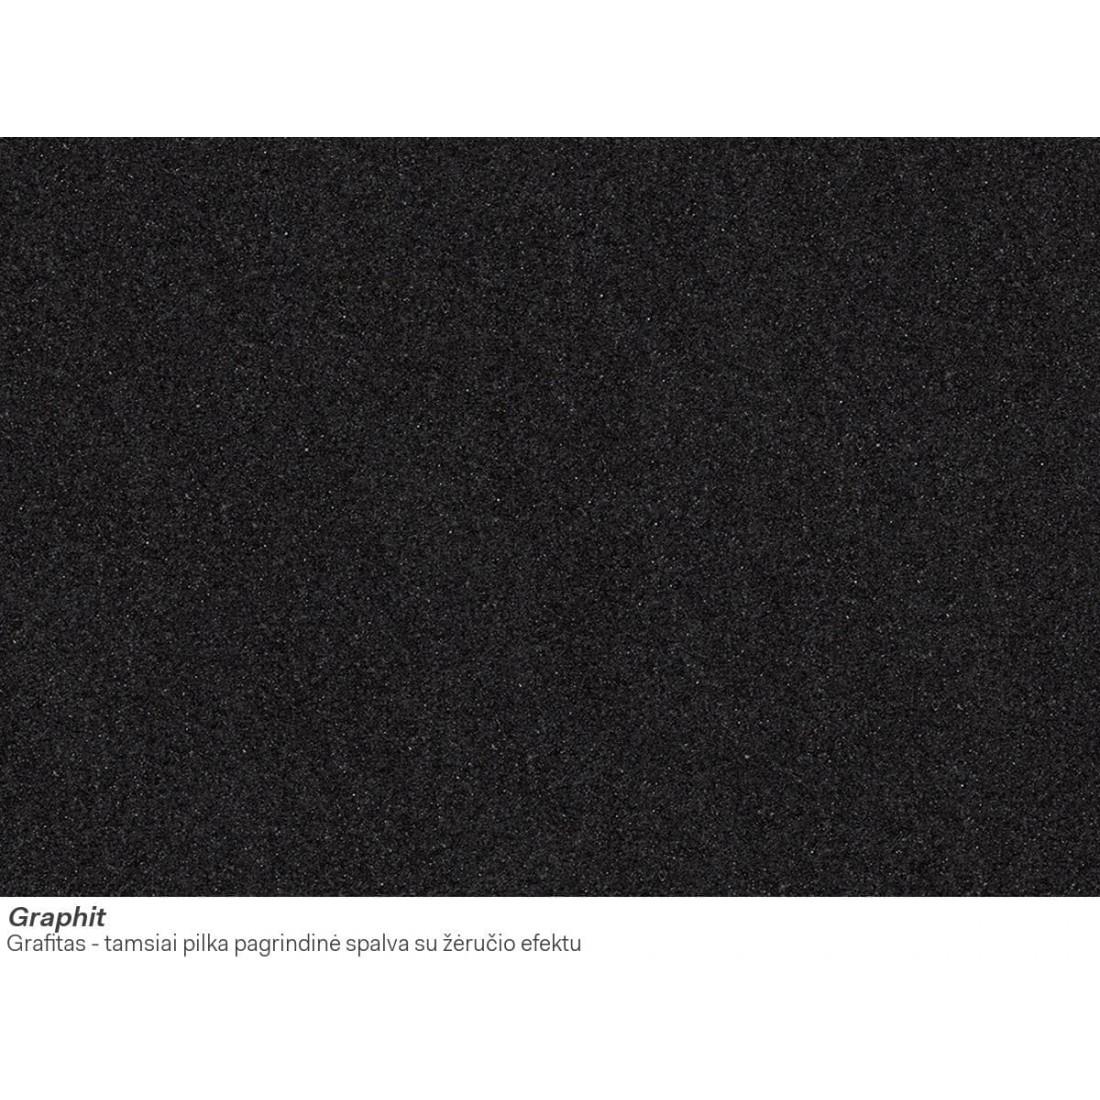 Akmens masės plautuvė Franke Kubus 2 KNG 110-52, Graphit